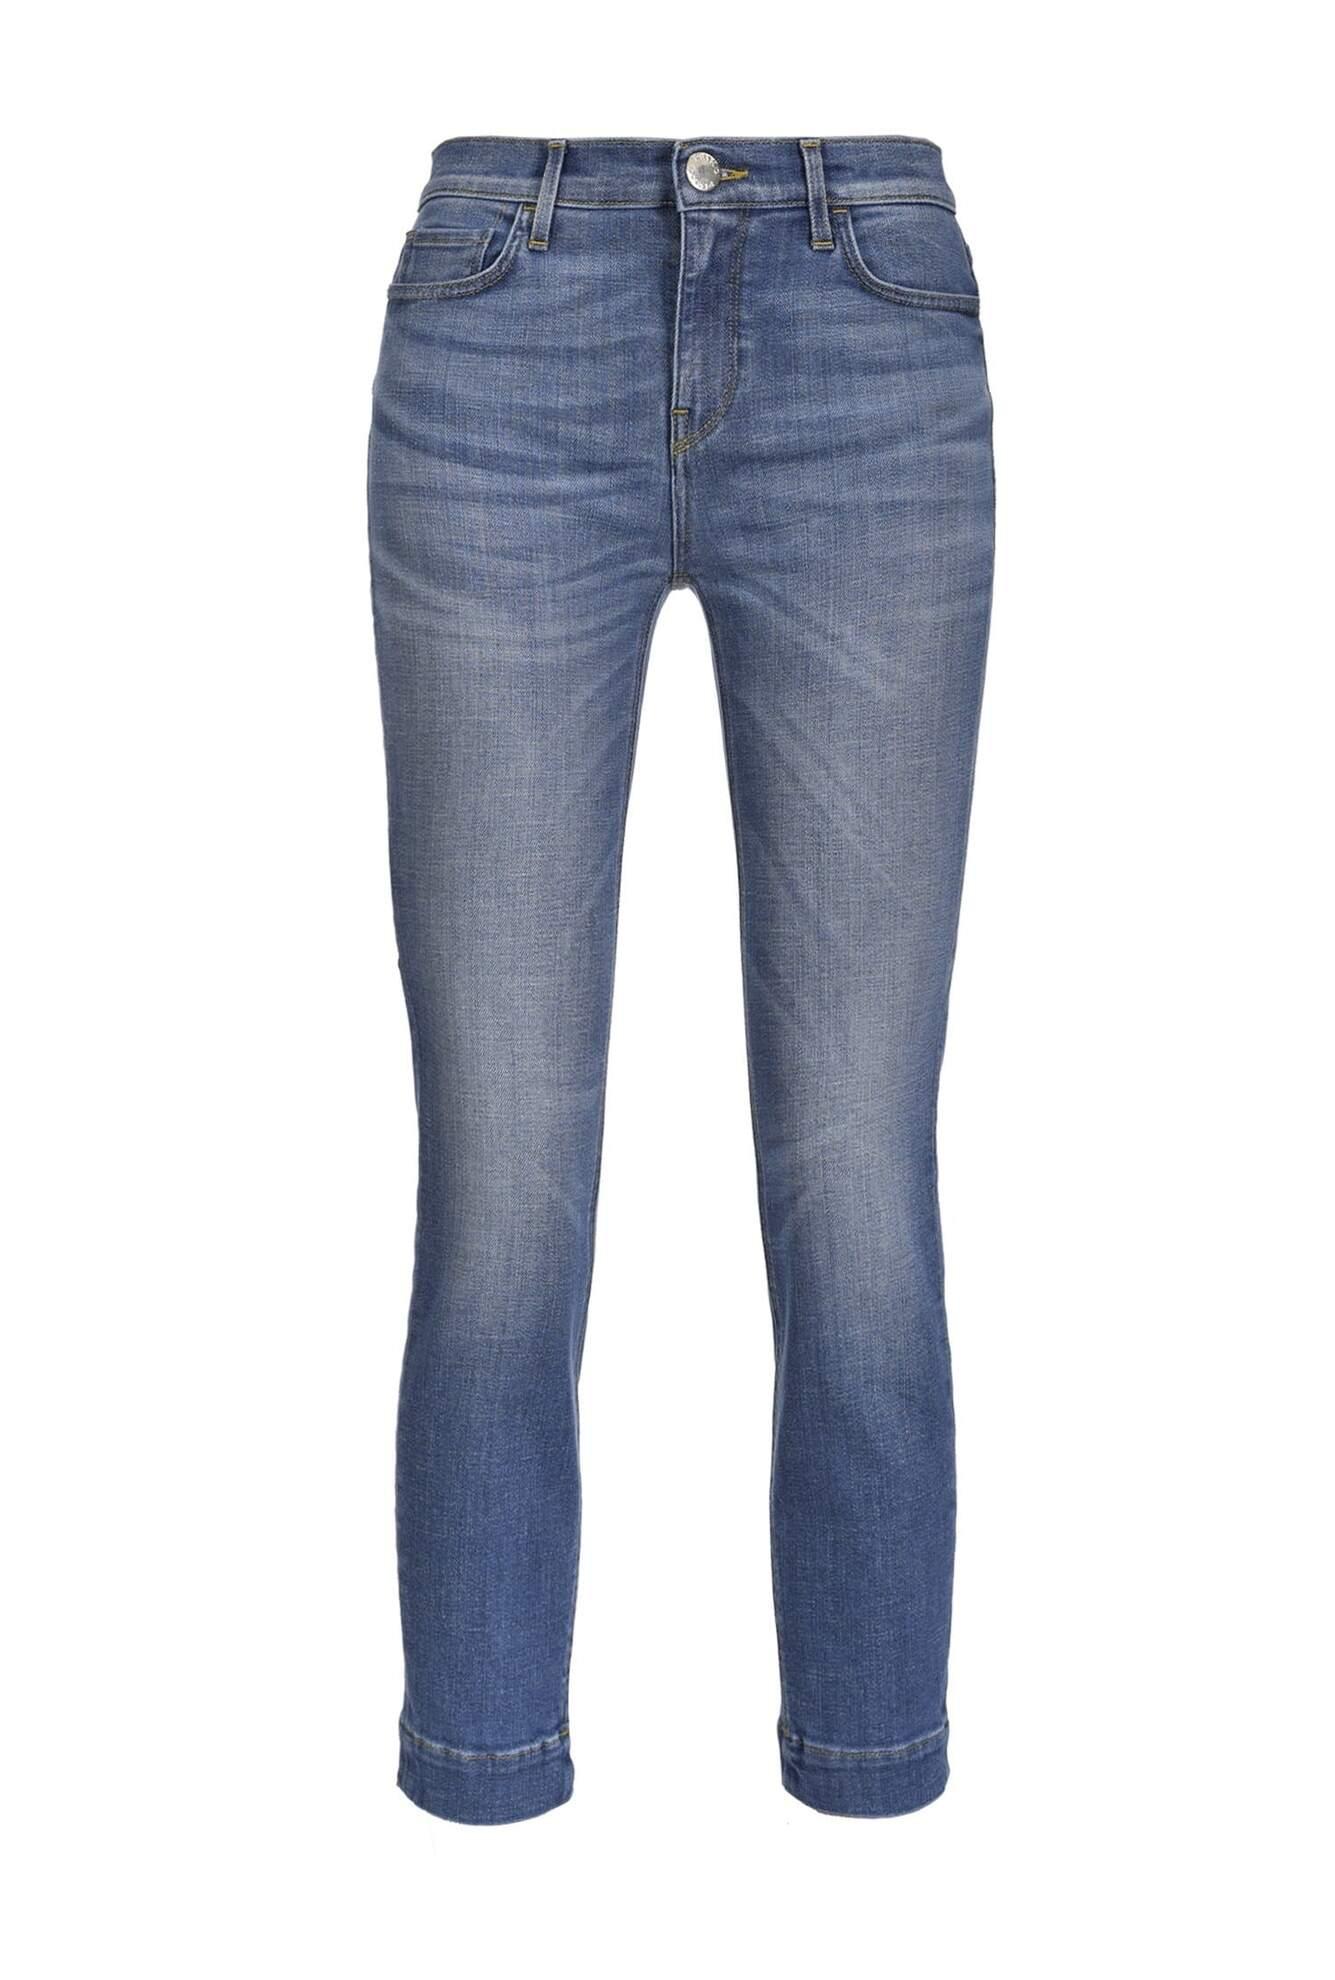 Jeans Skinny Cropped In Denim Comfort - Pinko